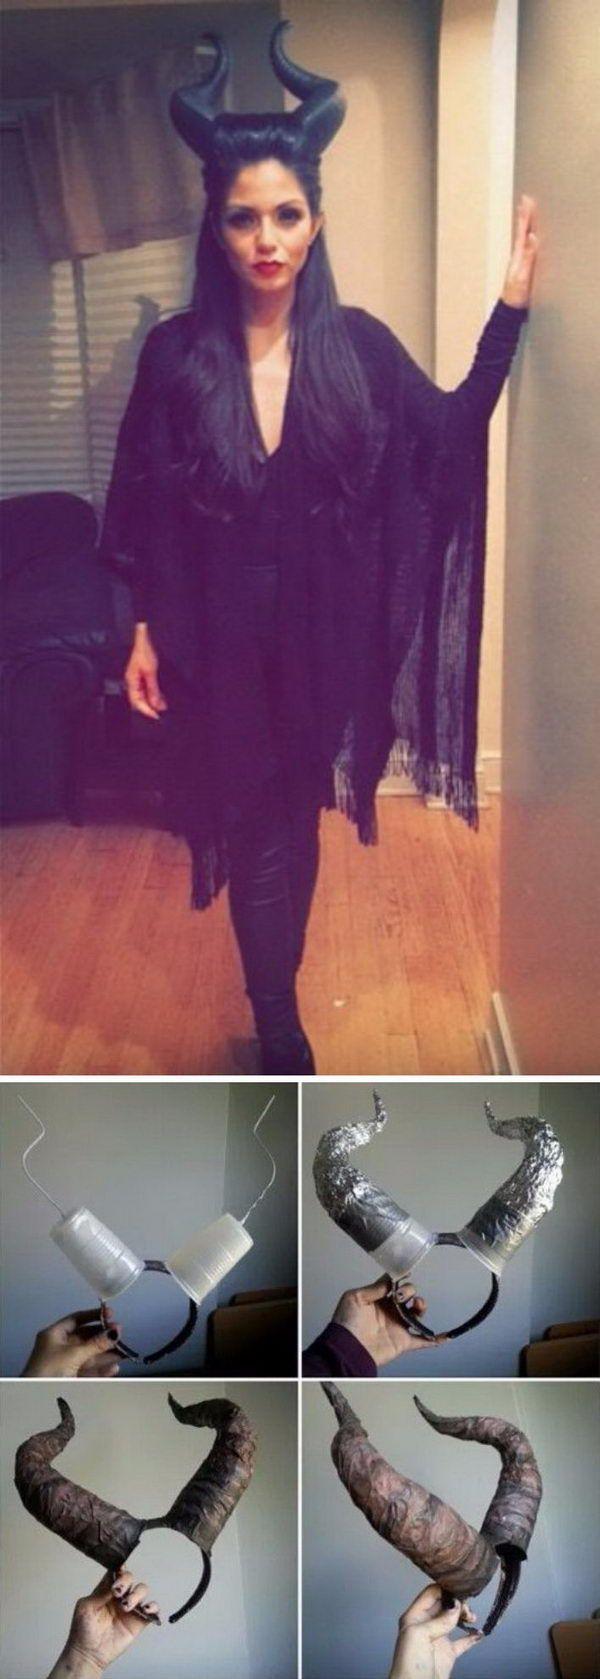 15+ Super Fun Halloween Costumes for Girls   Starbucks costume ...